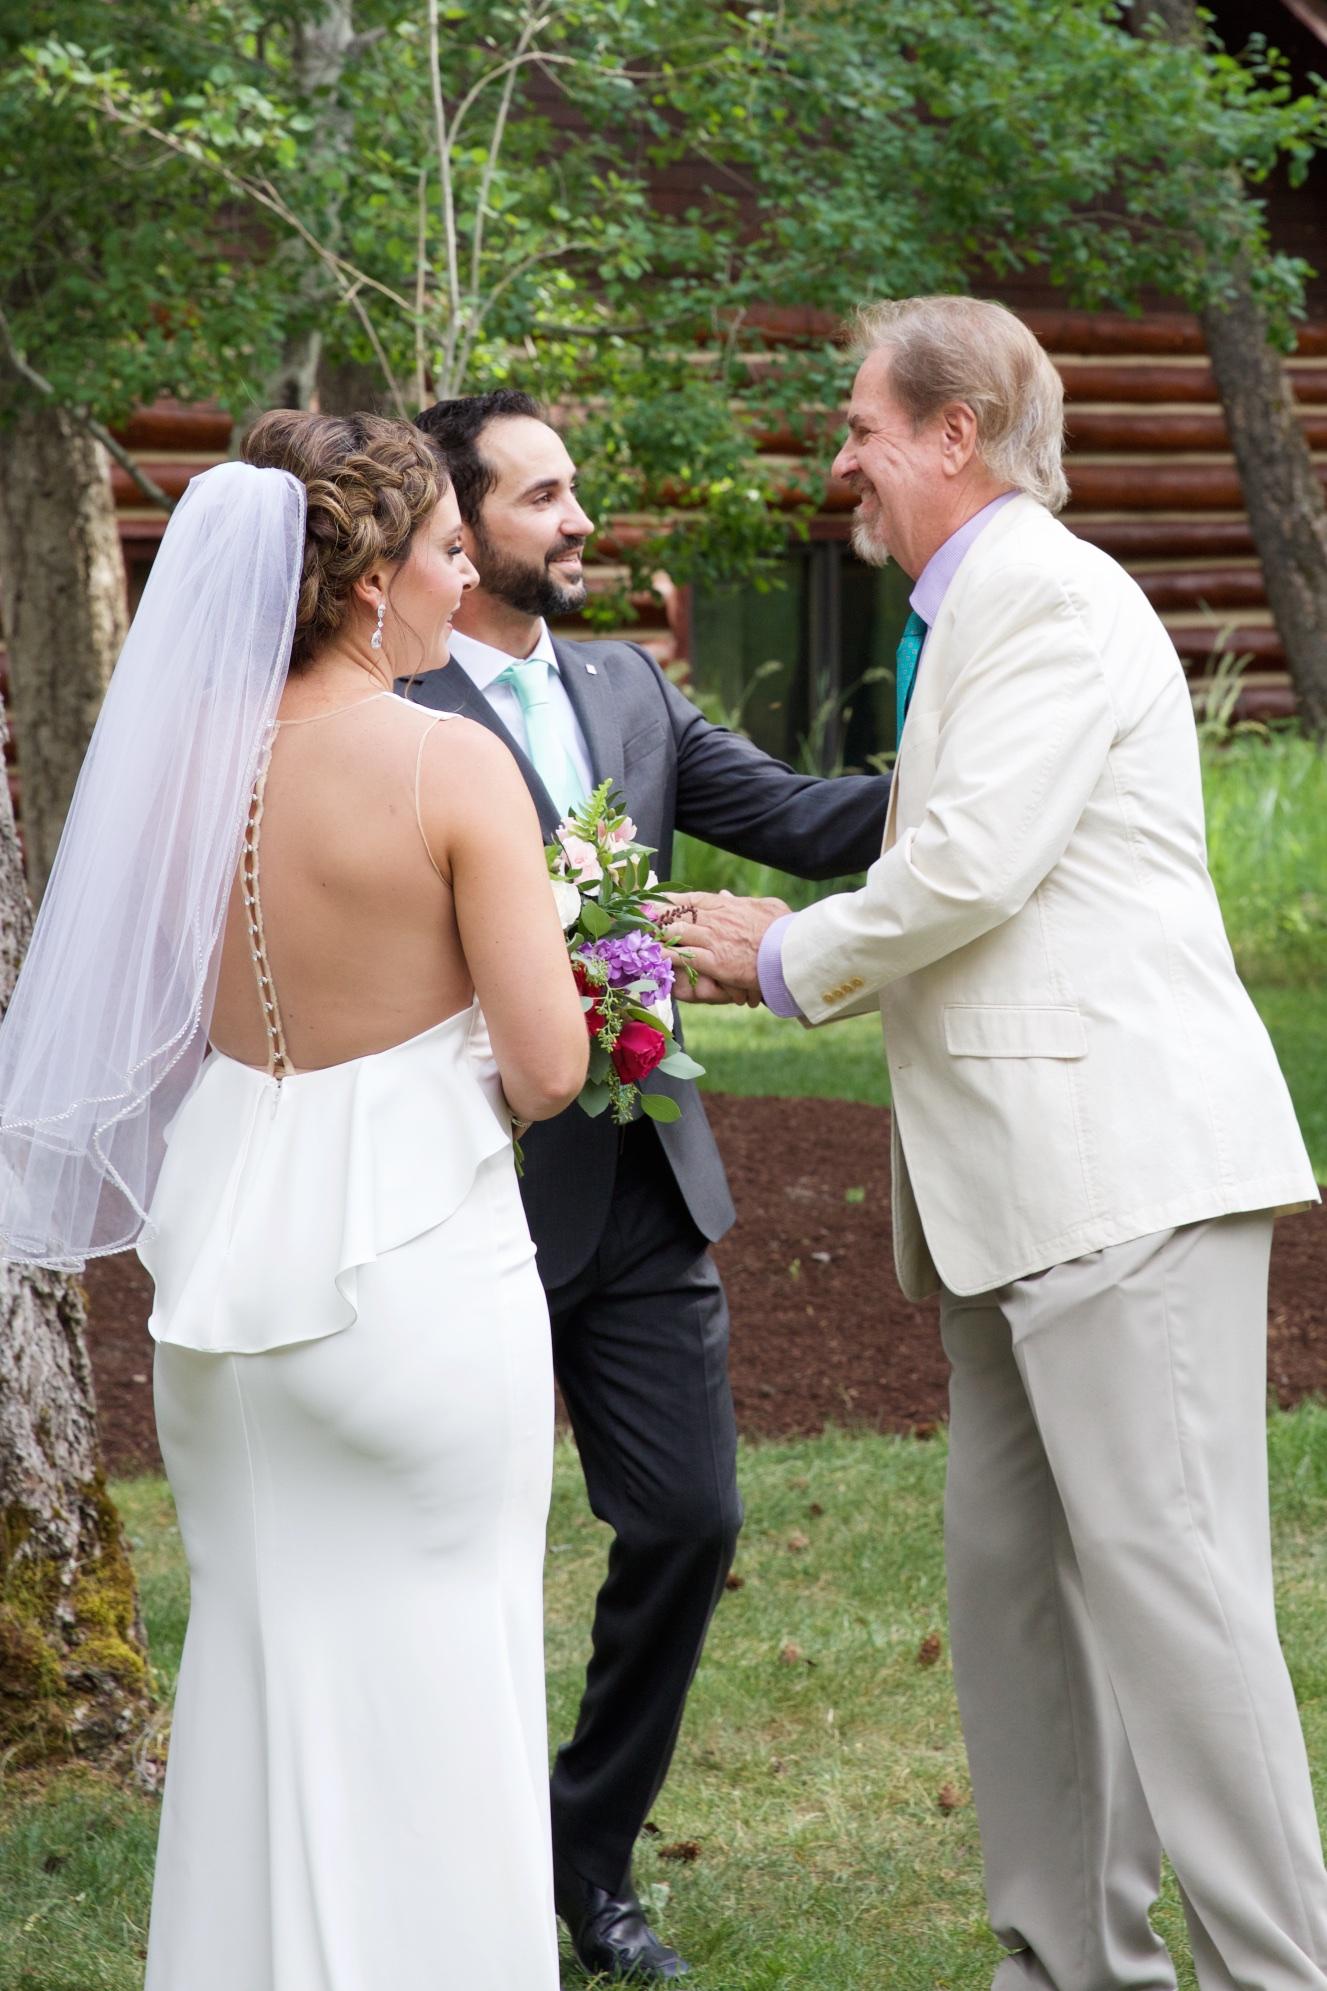 lindseyjane_wedding026.jpg